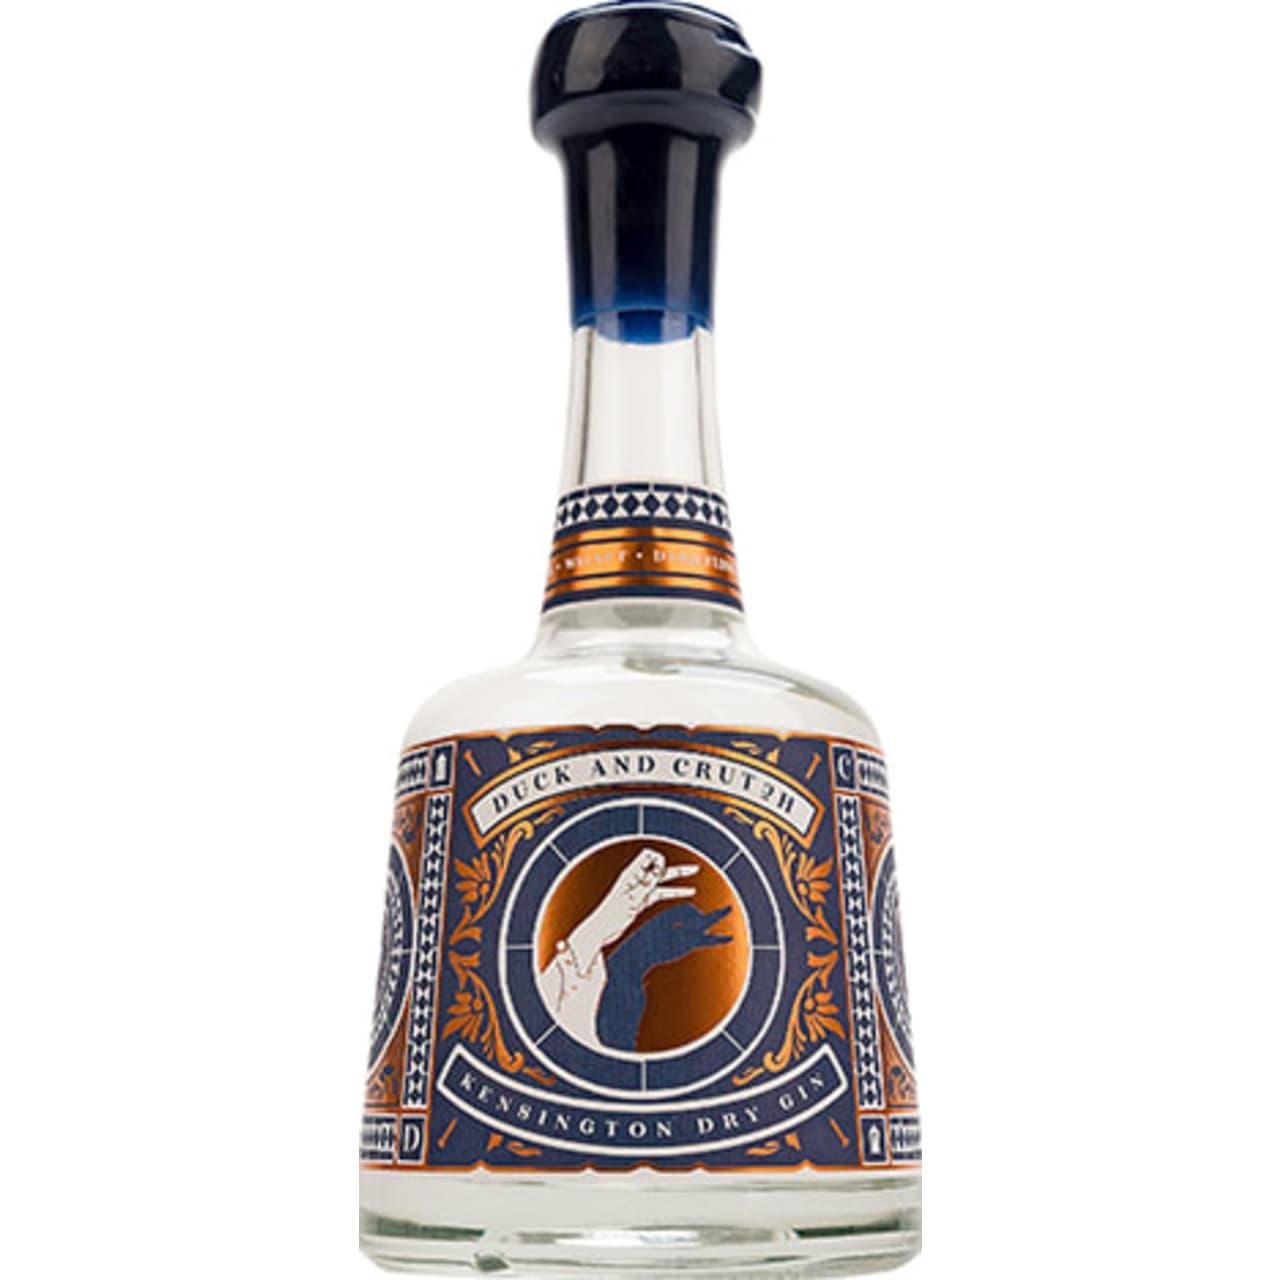 Product Image - Duck & Crutch Kensington Dry Gin